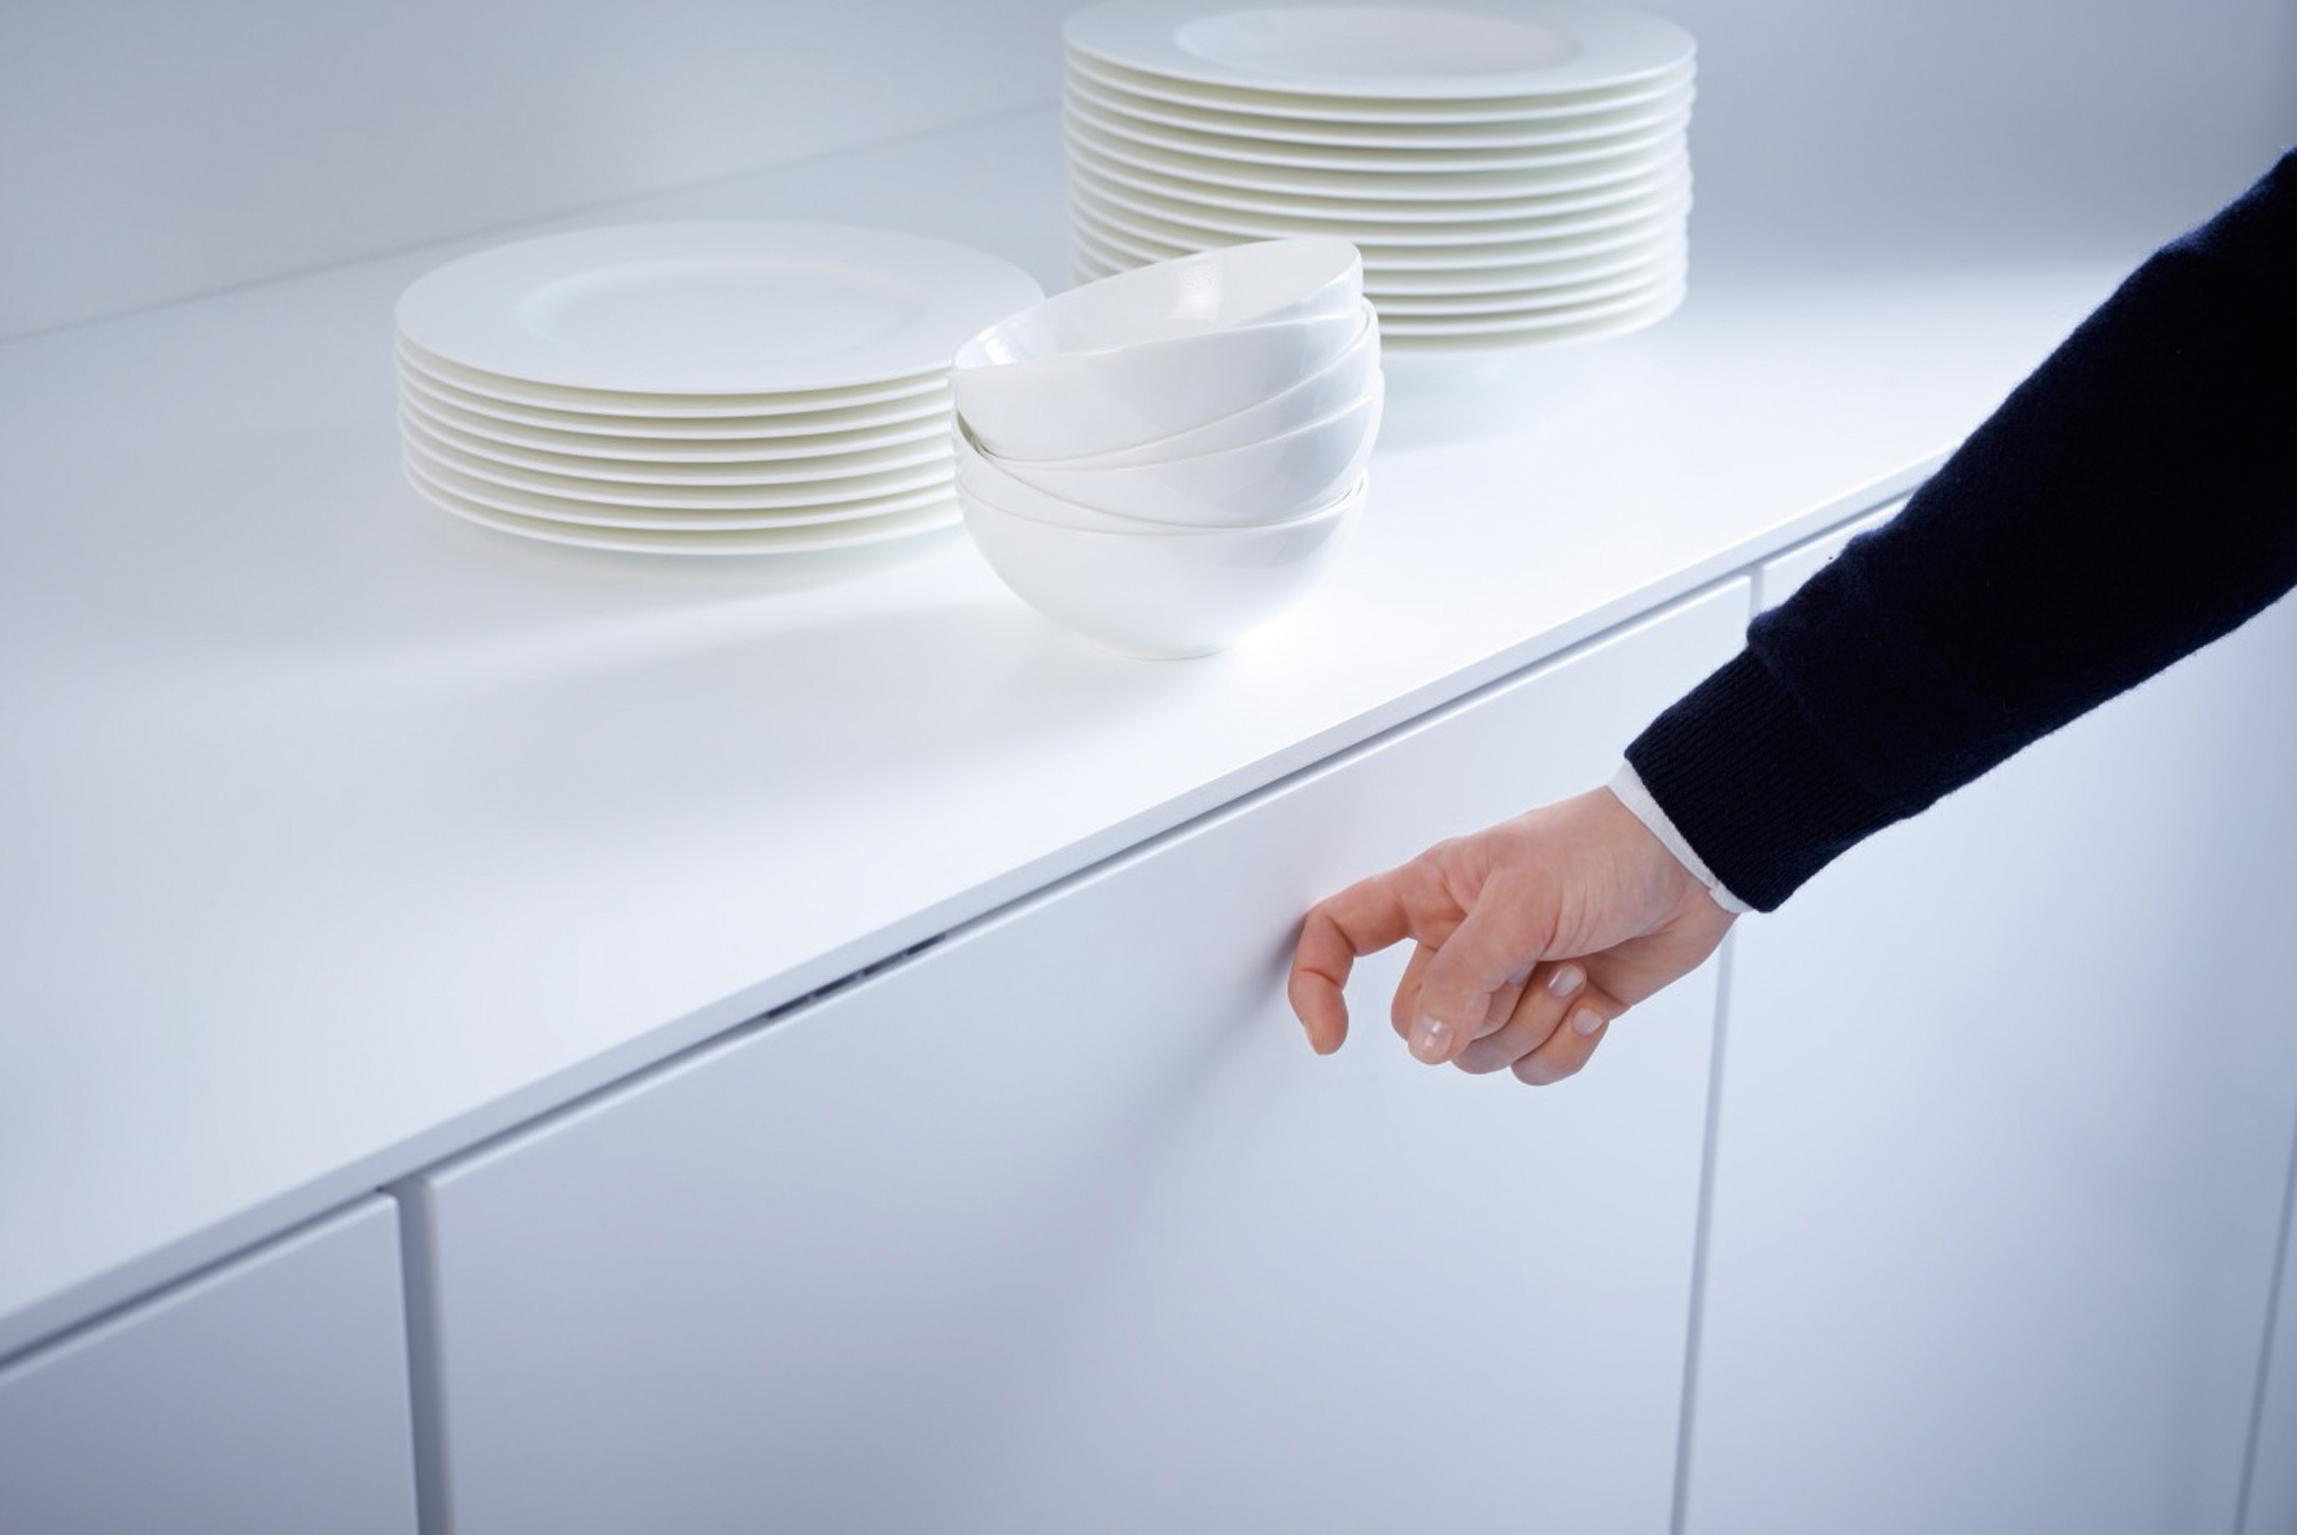 Communiqu s de presse for Cuisine sans poignee